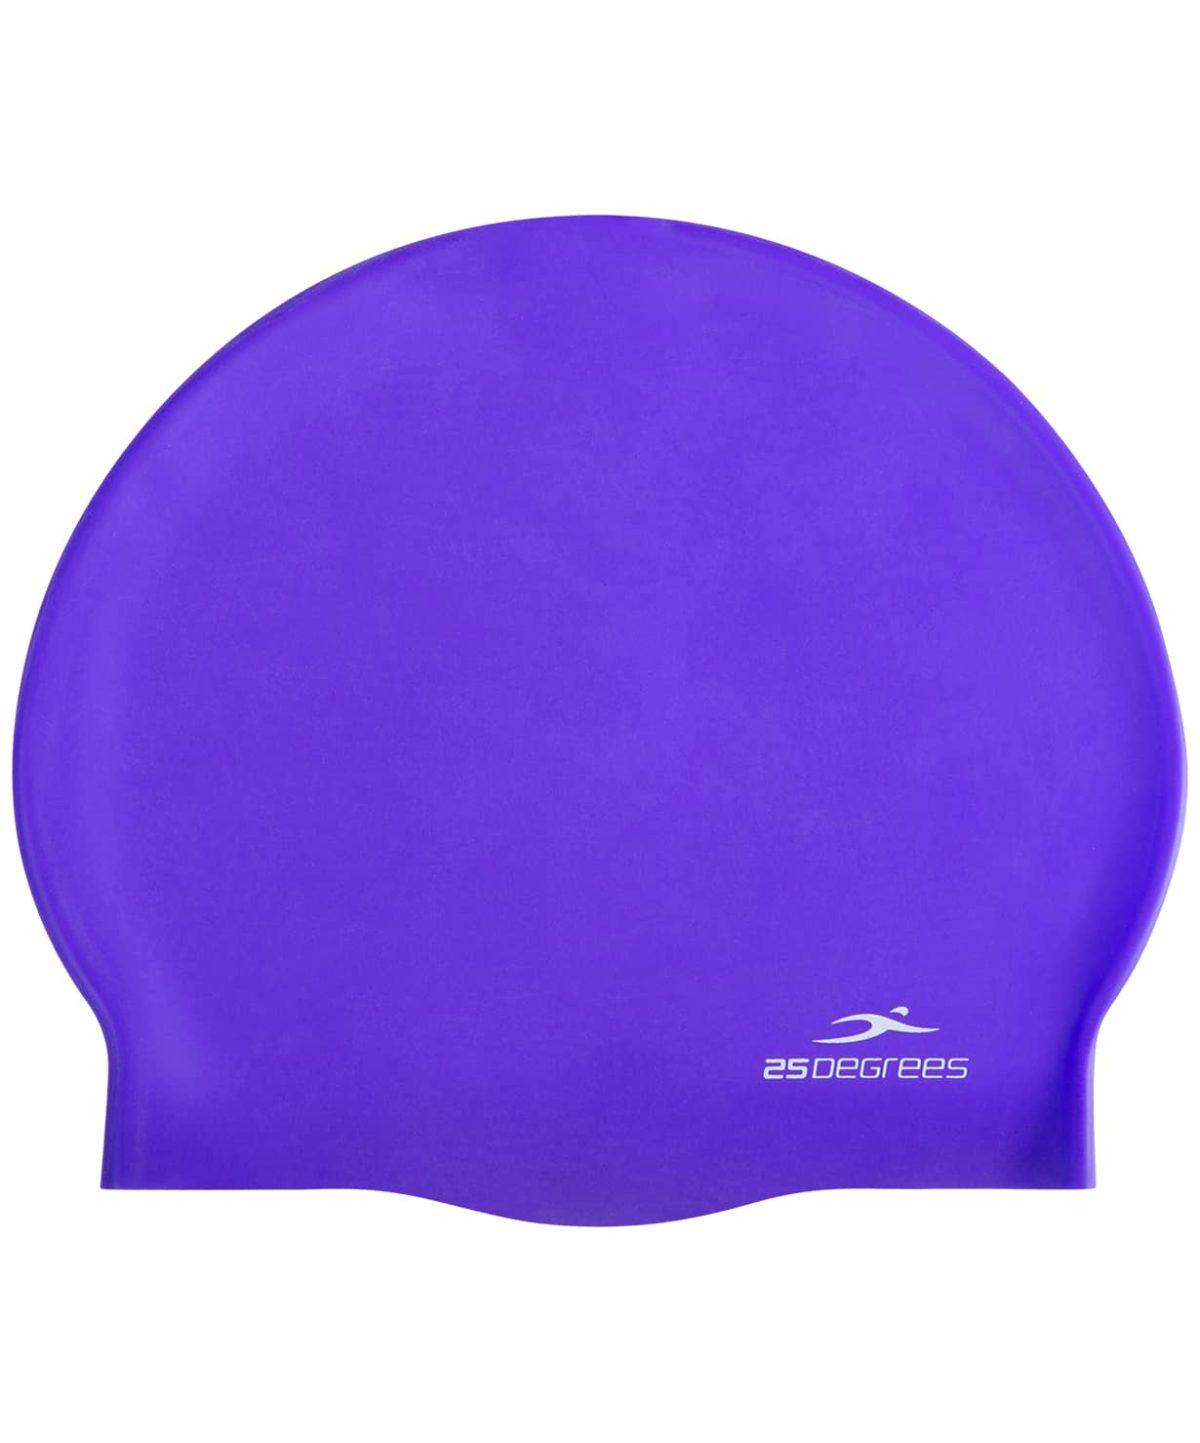 25DEGREES Шапочка для плавания Nuance, силикон  25D21004A: фиолетовый - 2